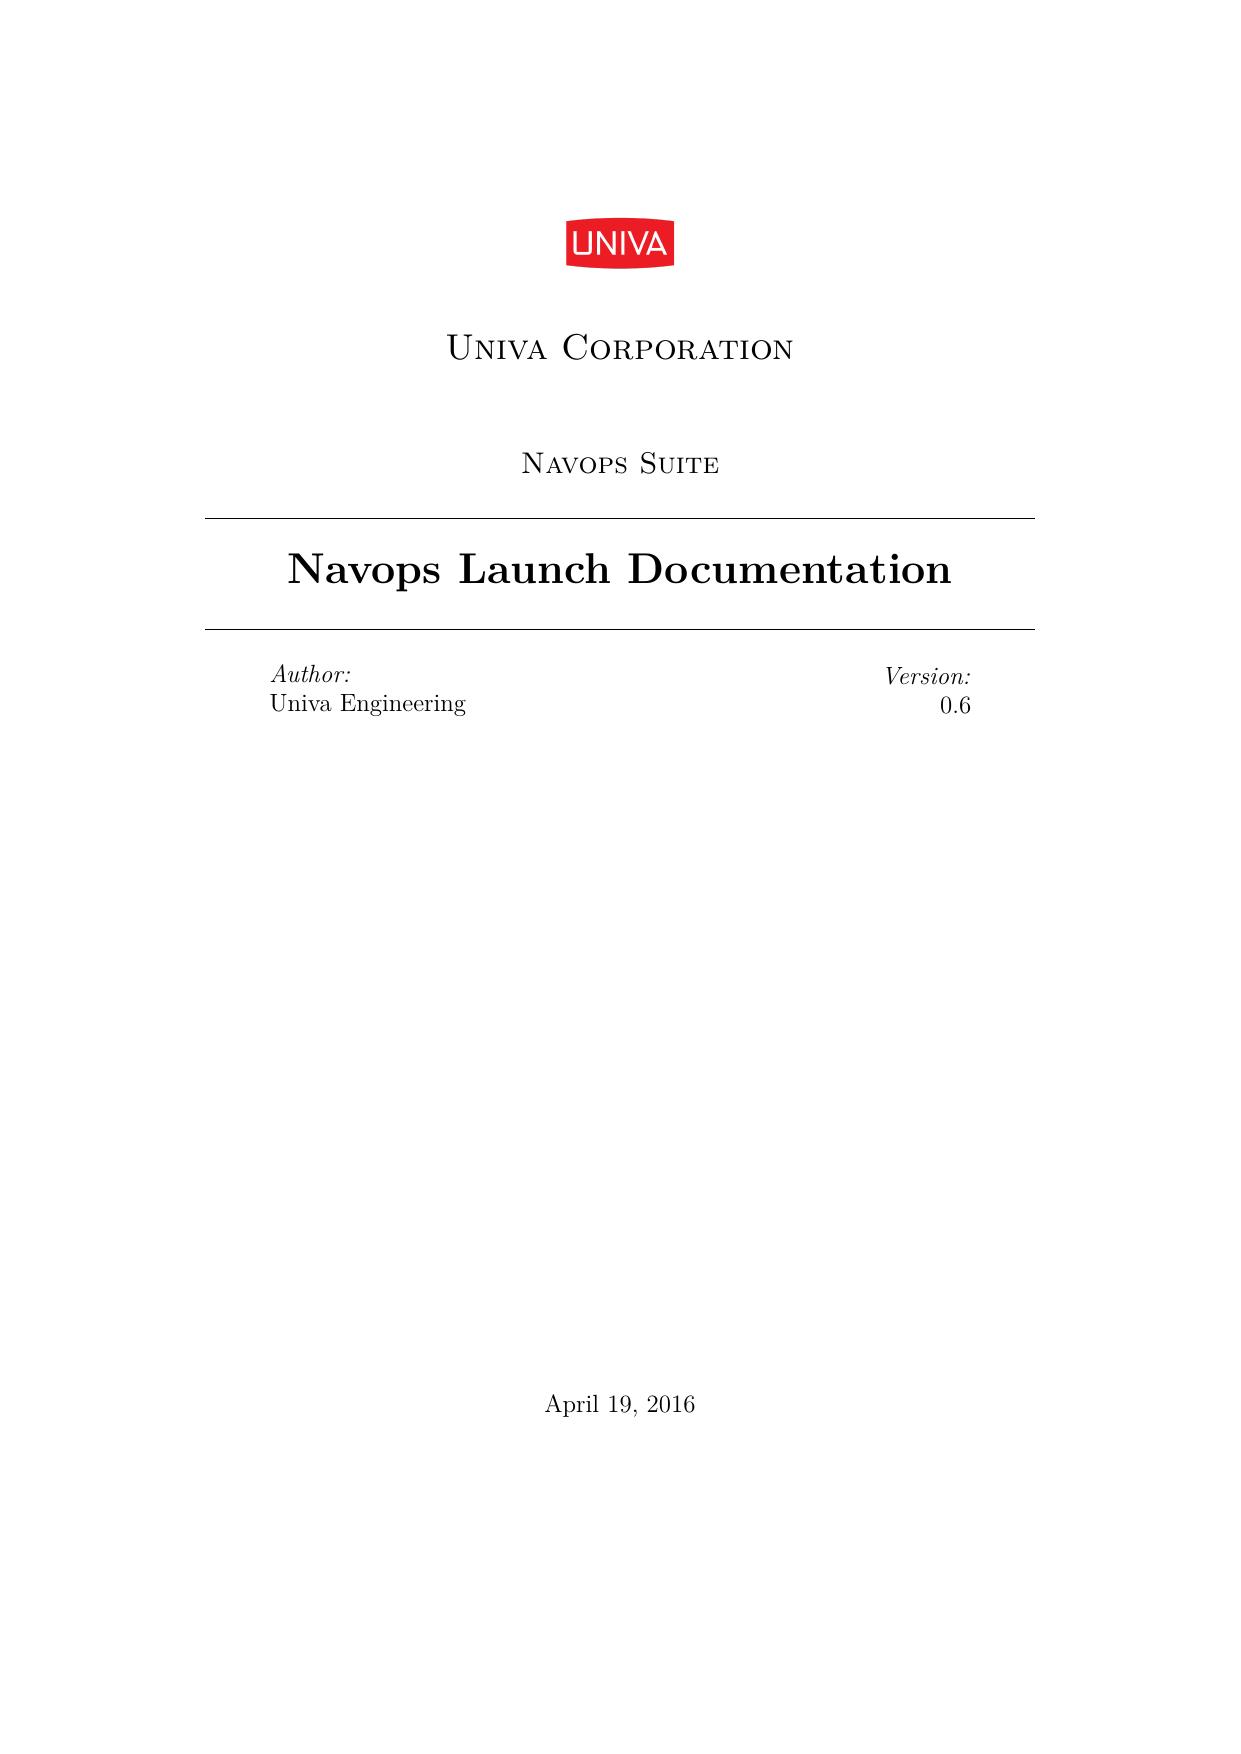 Navops Launch Documentation | manualzz com